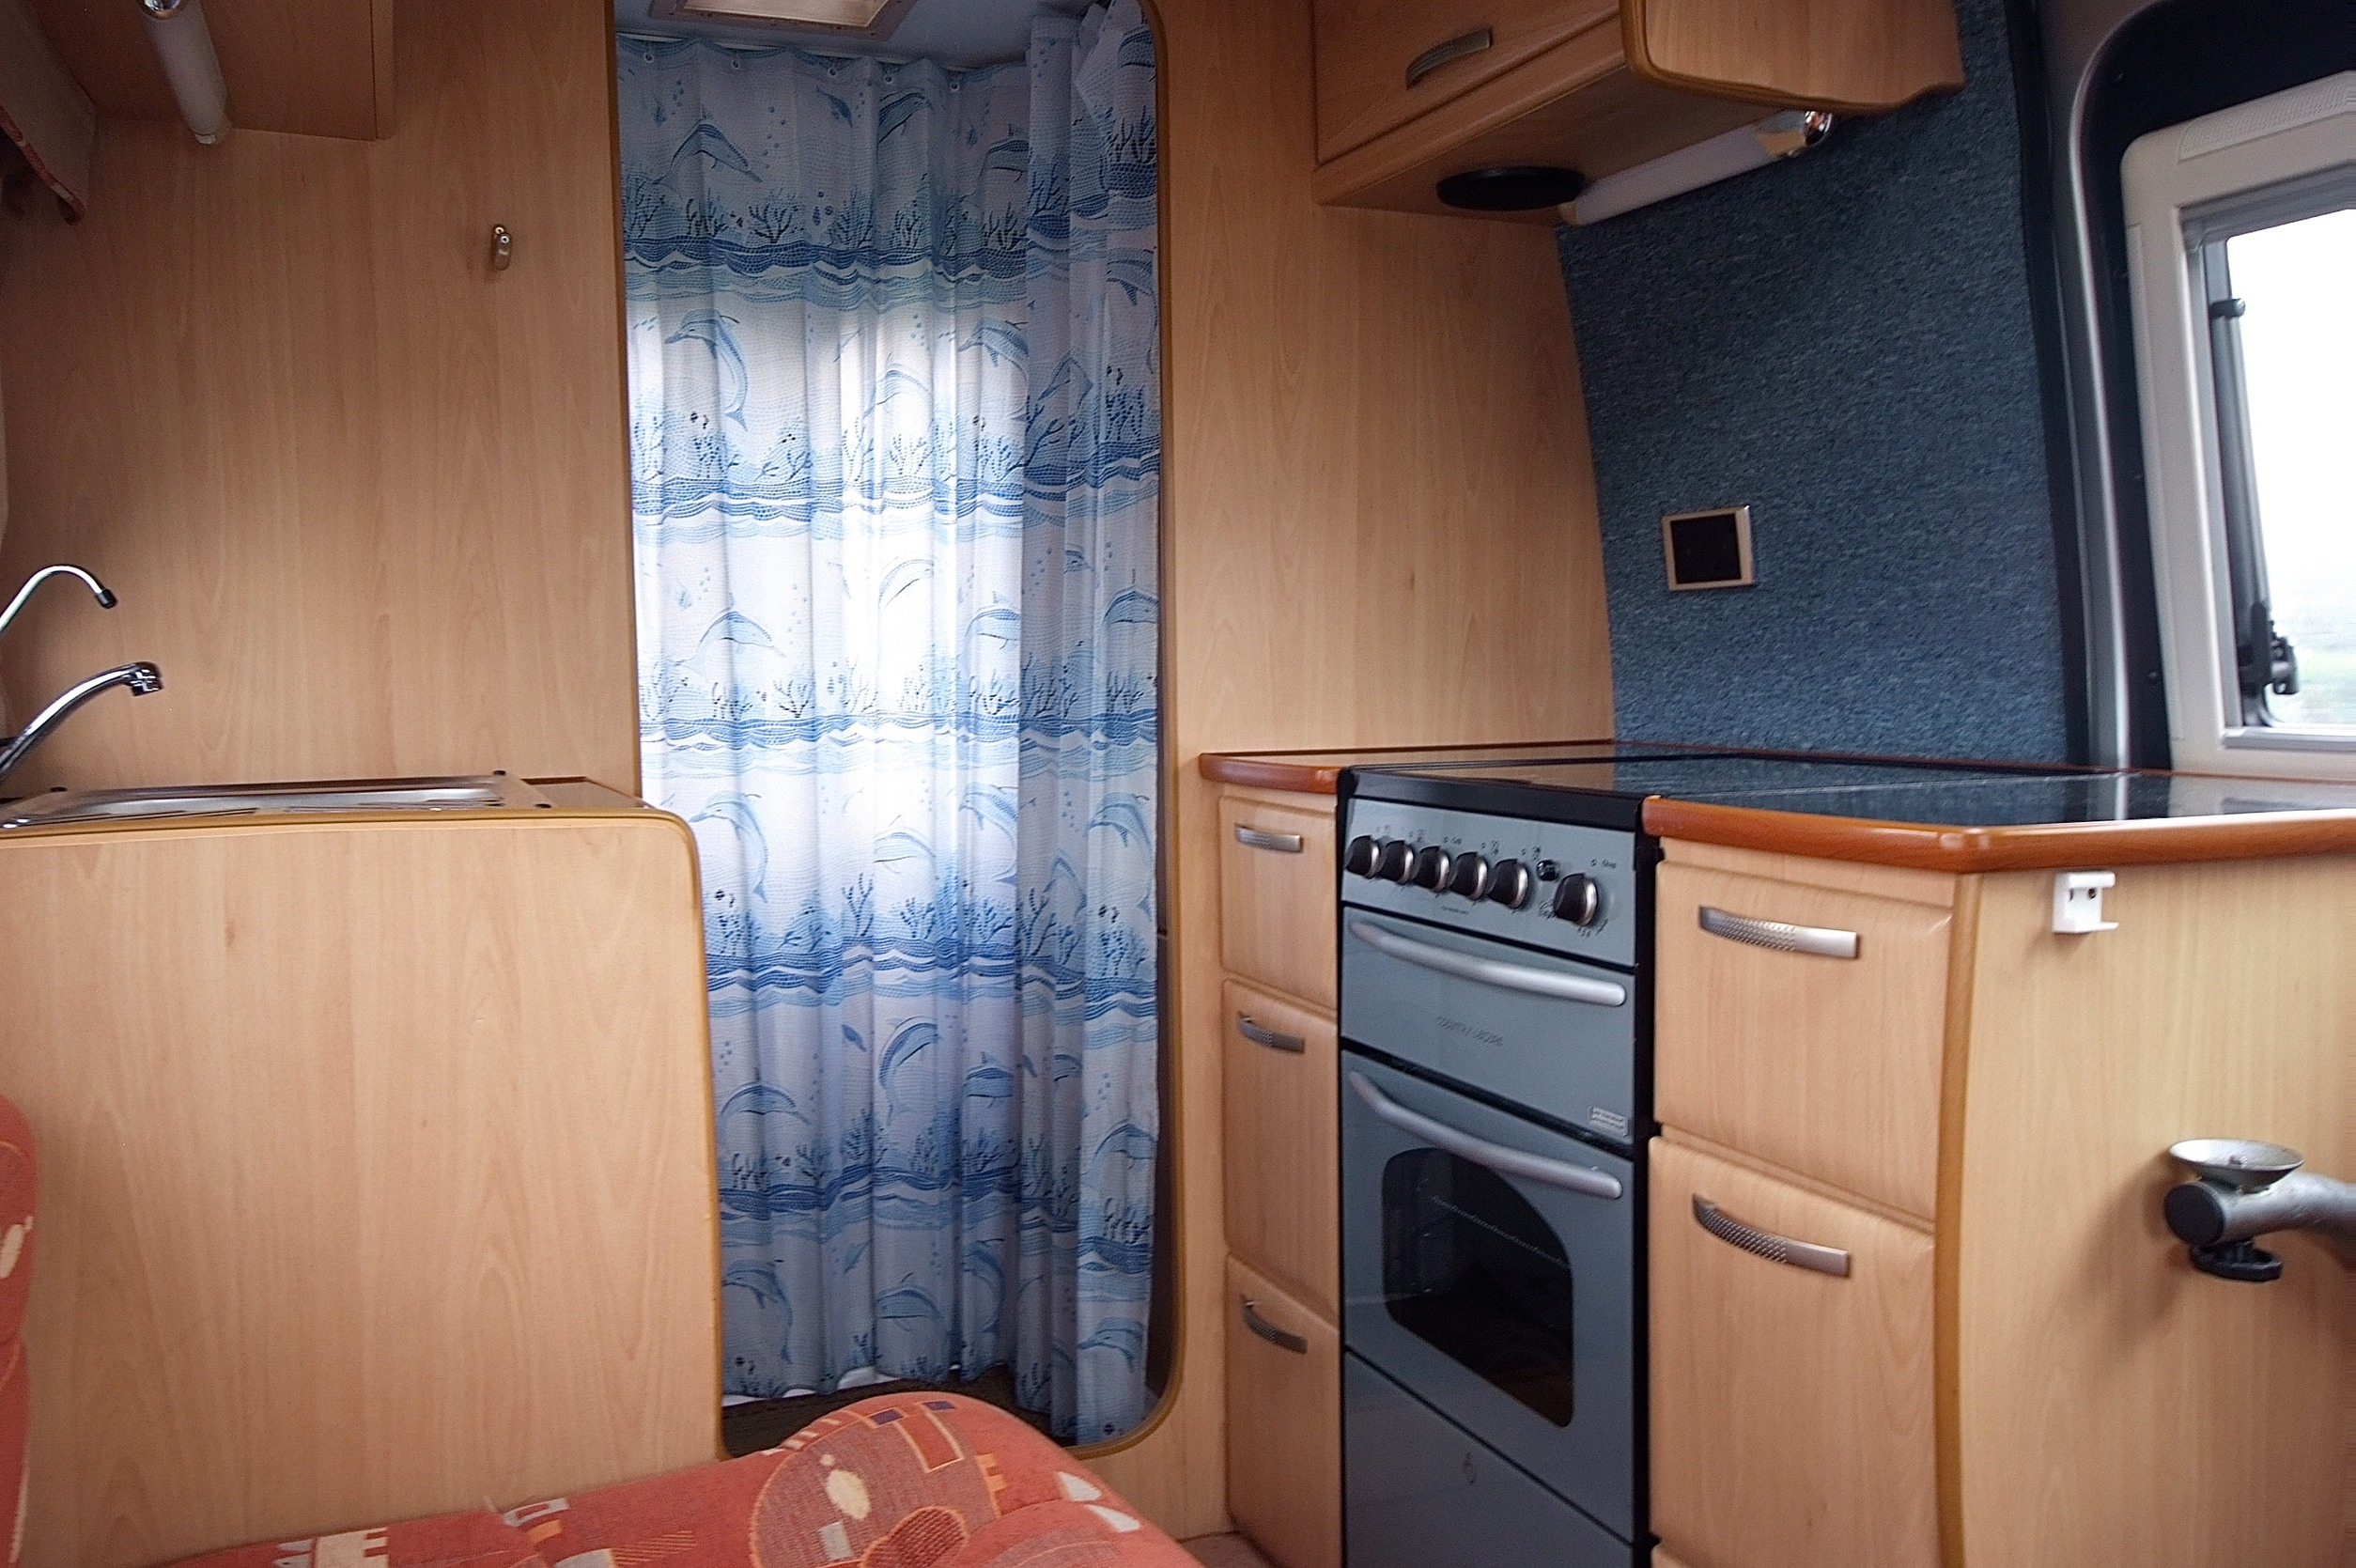 Sold Timberland Freedom 2003 Fiat 2 8 Jtd Hightop Camper